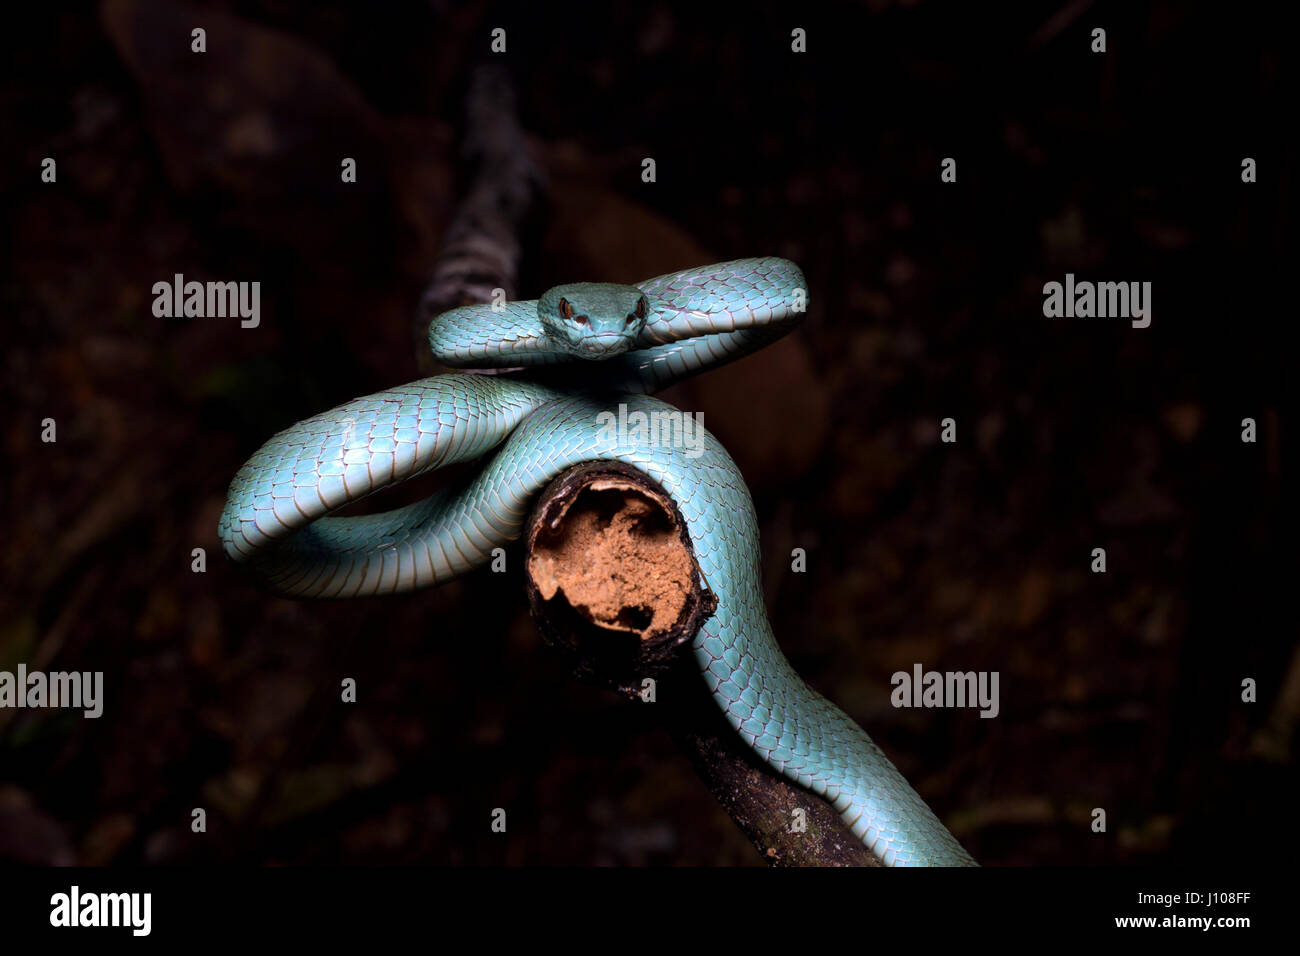 Sunda Island pit viper Stock Photo